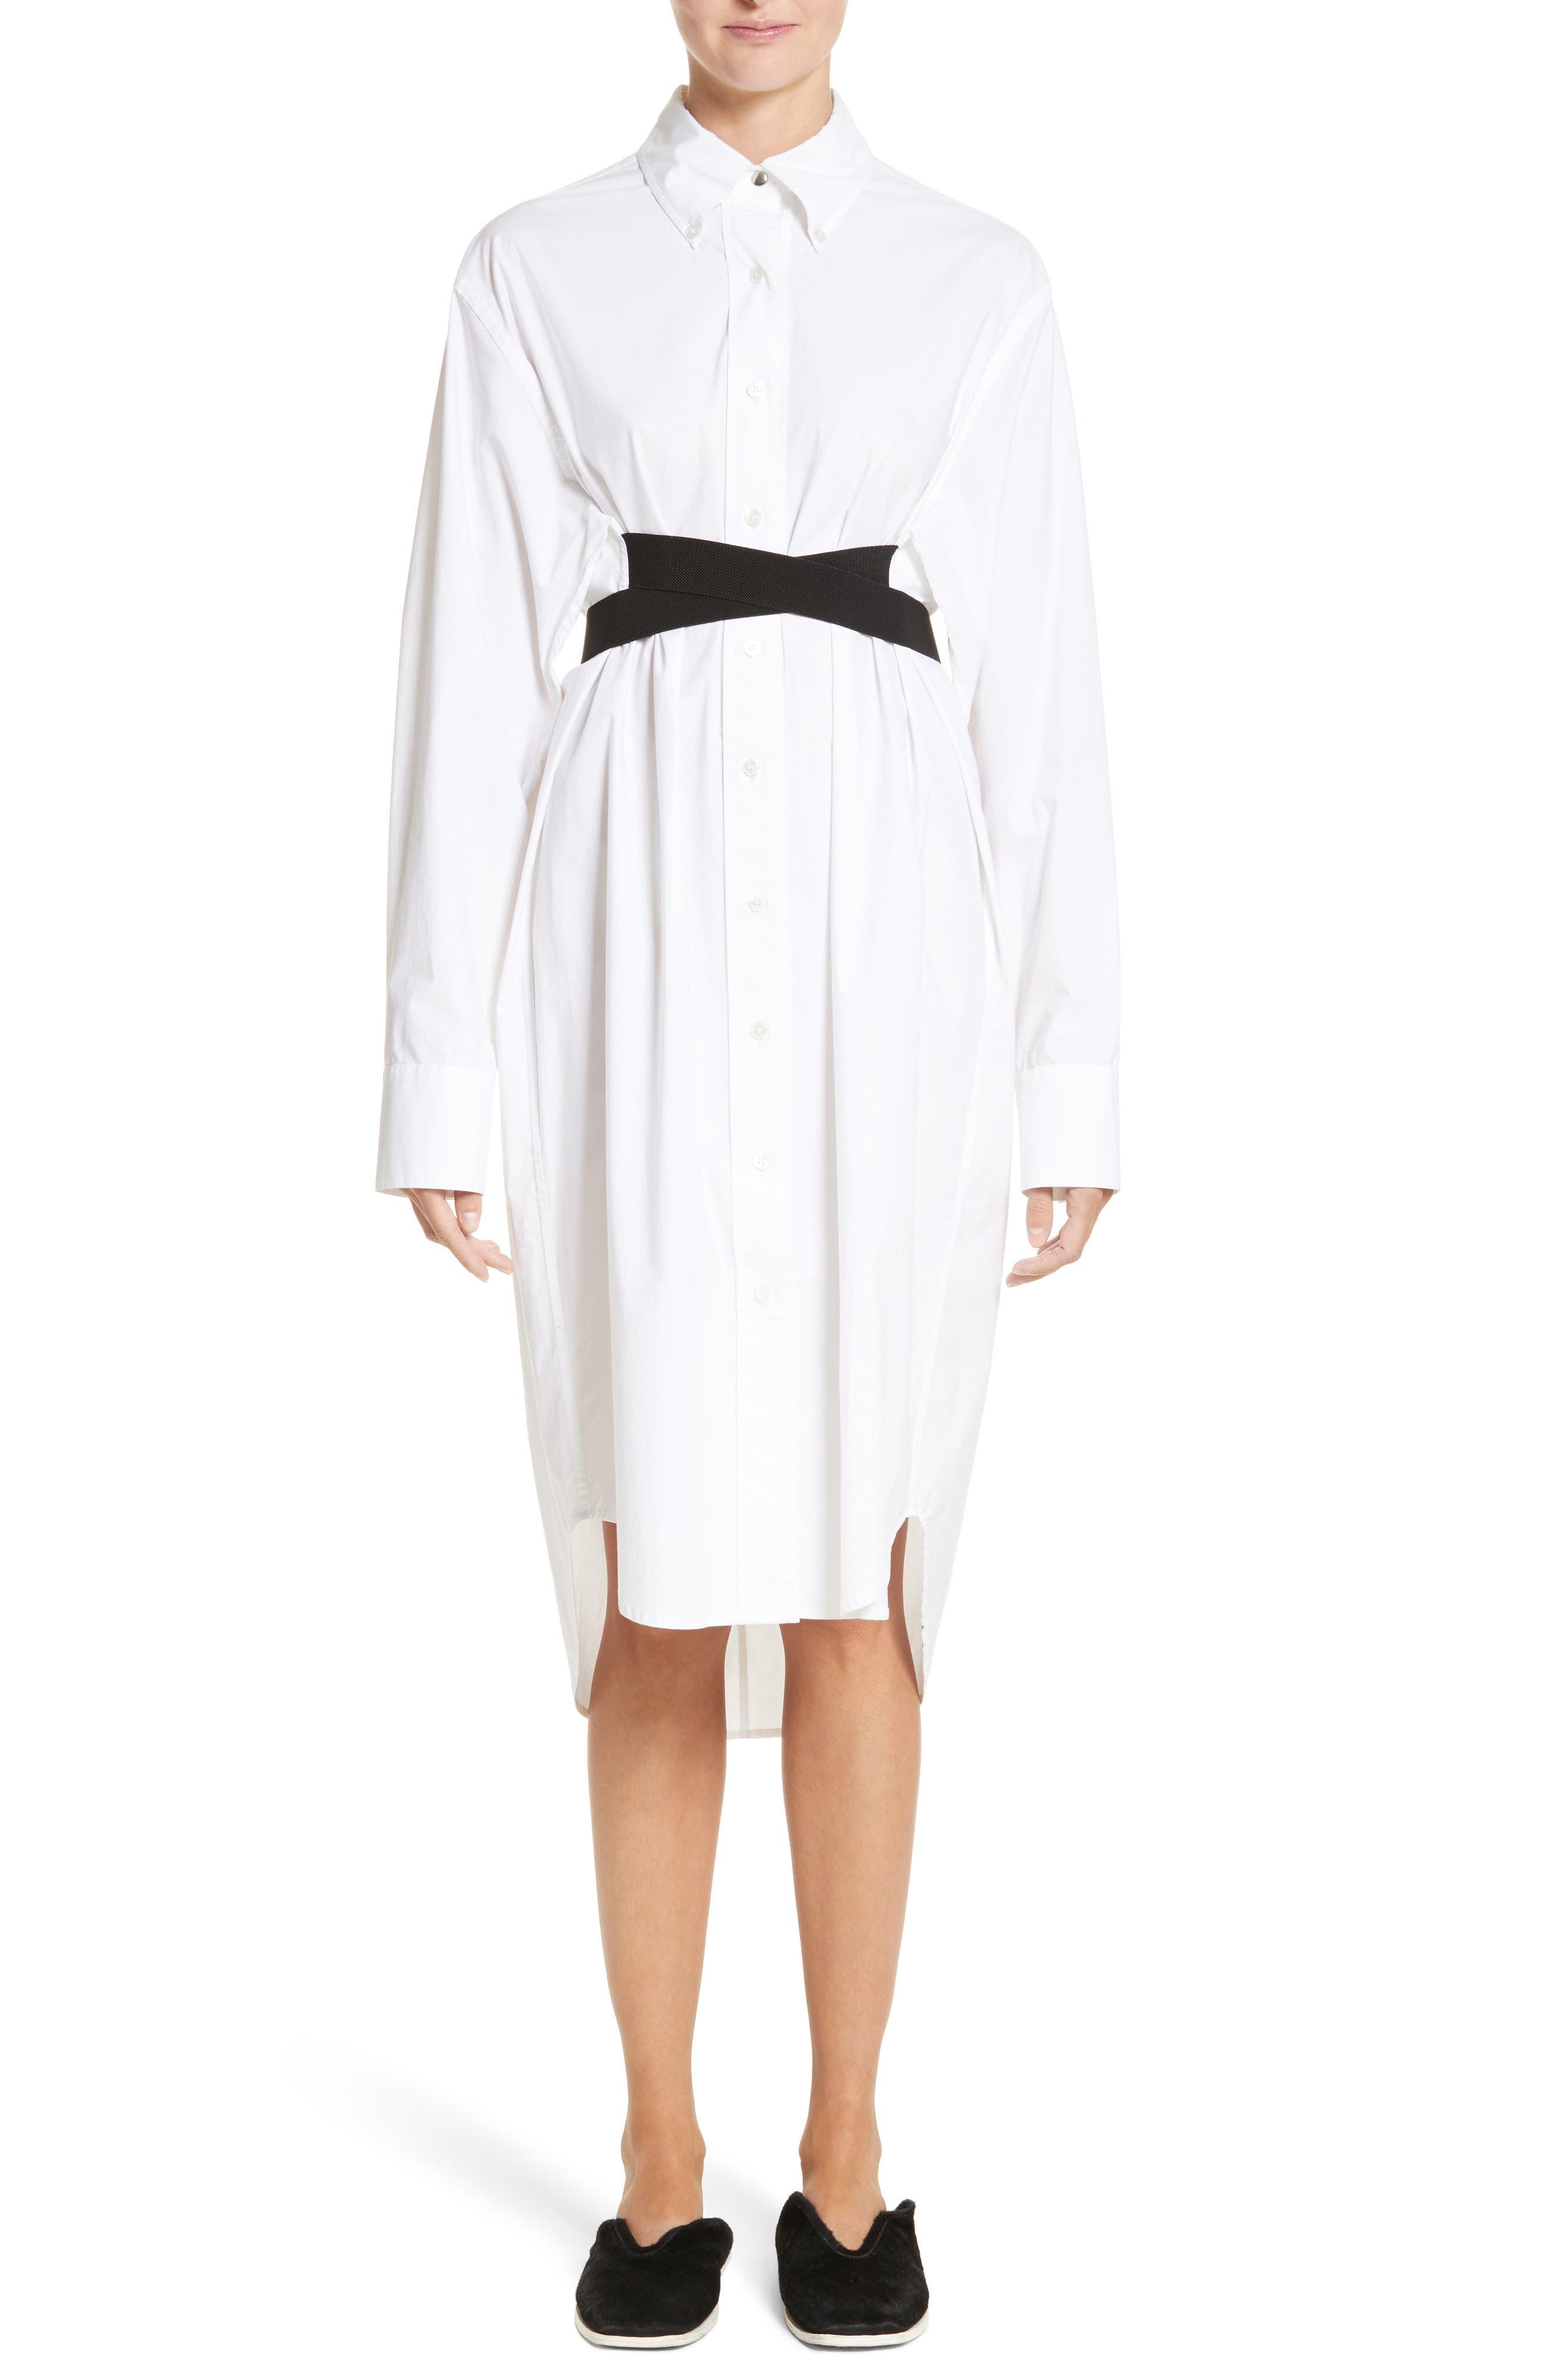 PSWL Belted Poplin Shirtdress,                             Main thumbnail 1, color,                             Optic White/ Black